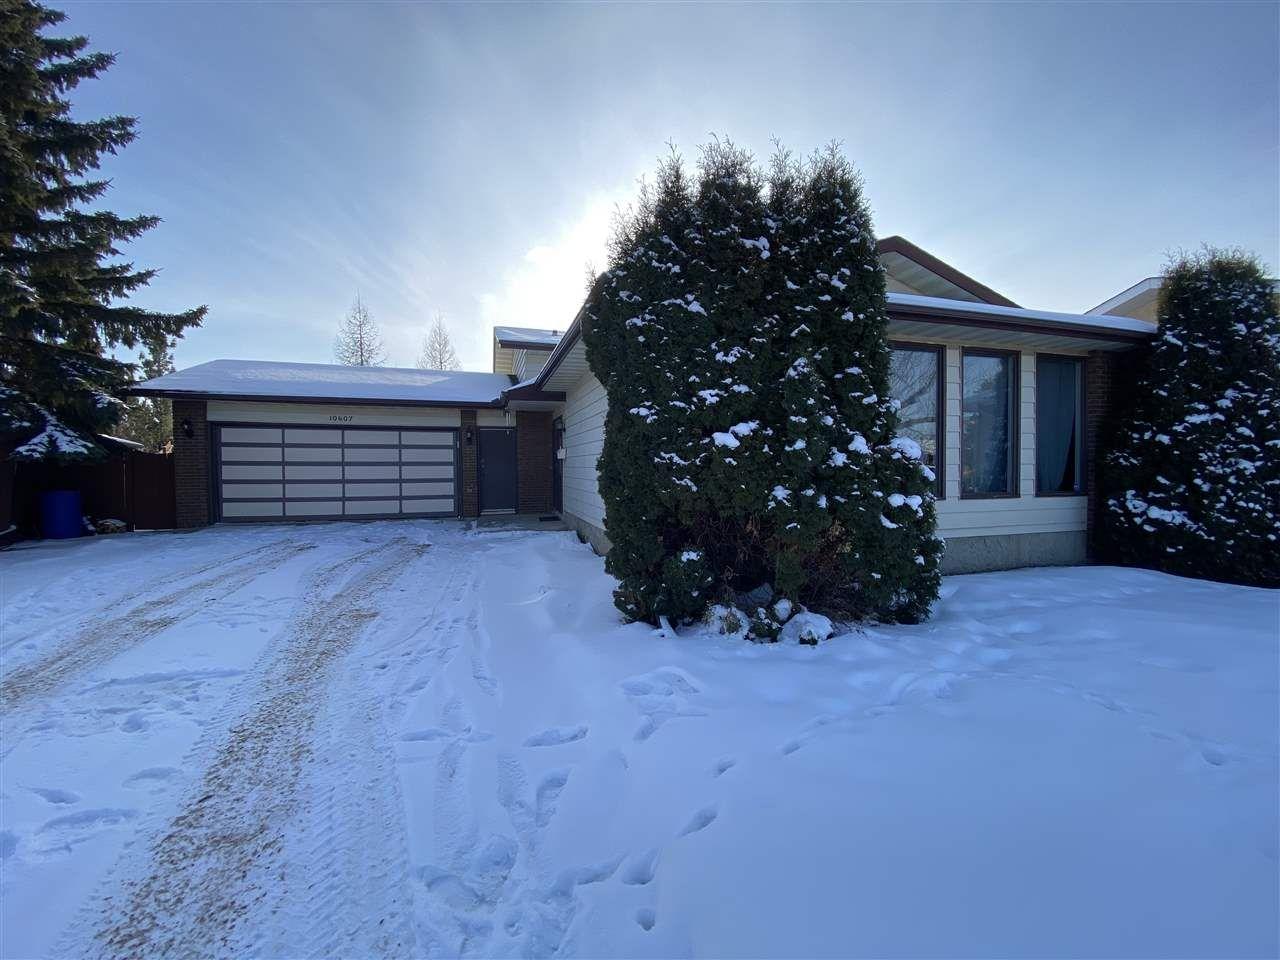 Main Photo: 10607 24 Avenue in Edmonton: Zone 16 House for sale : MLS®# E4227205